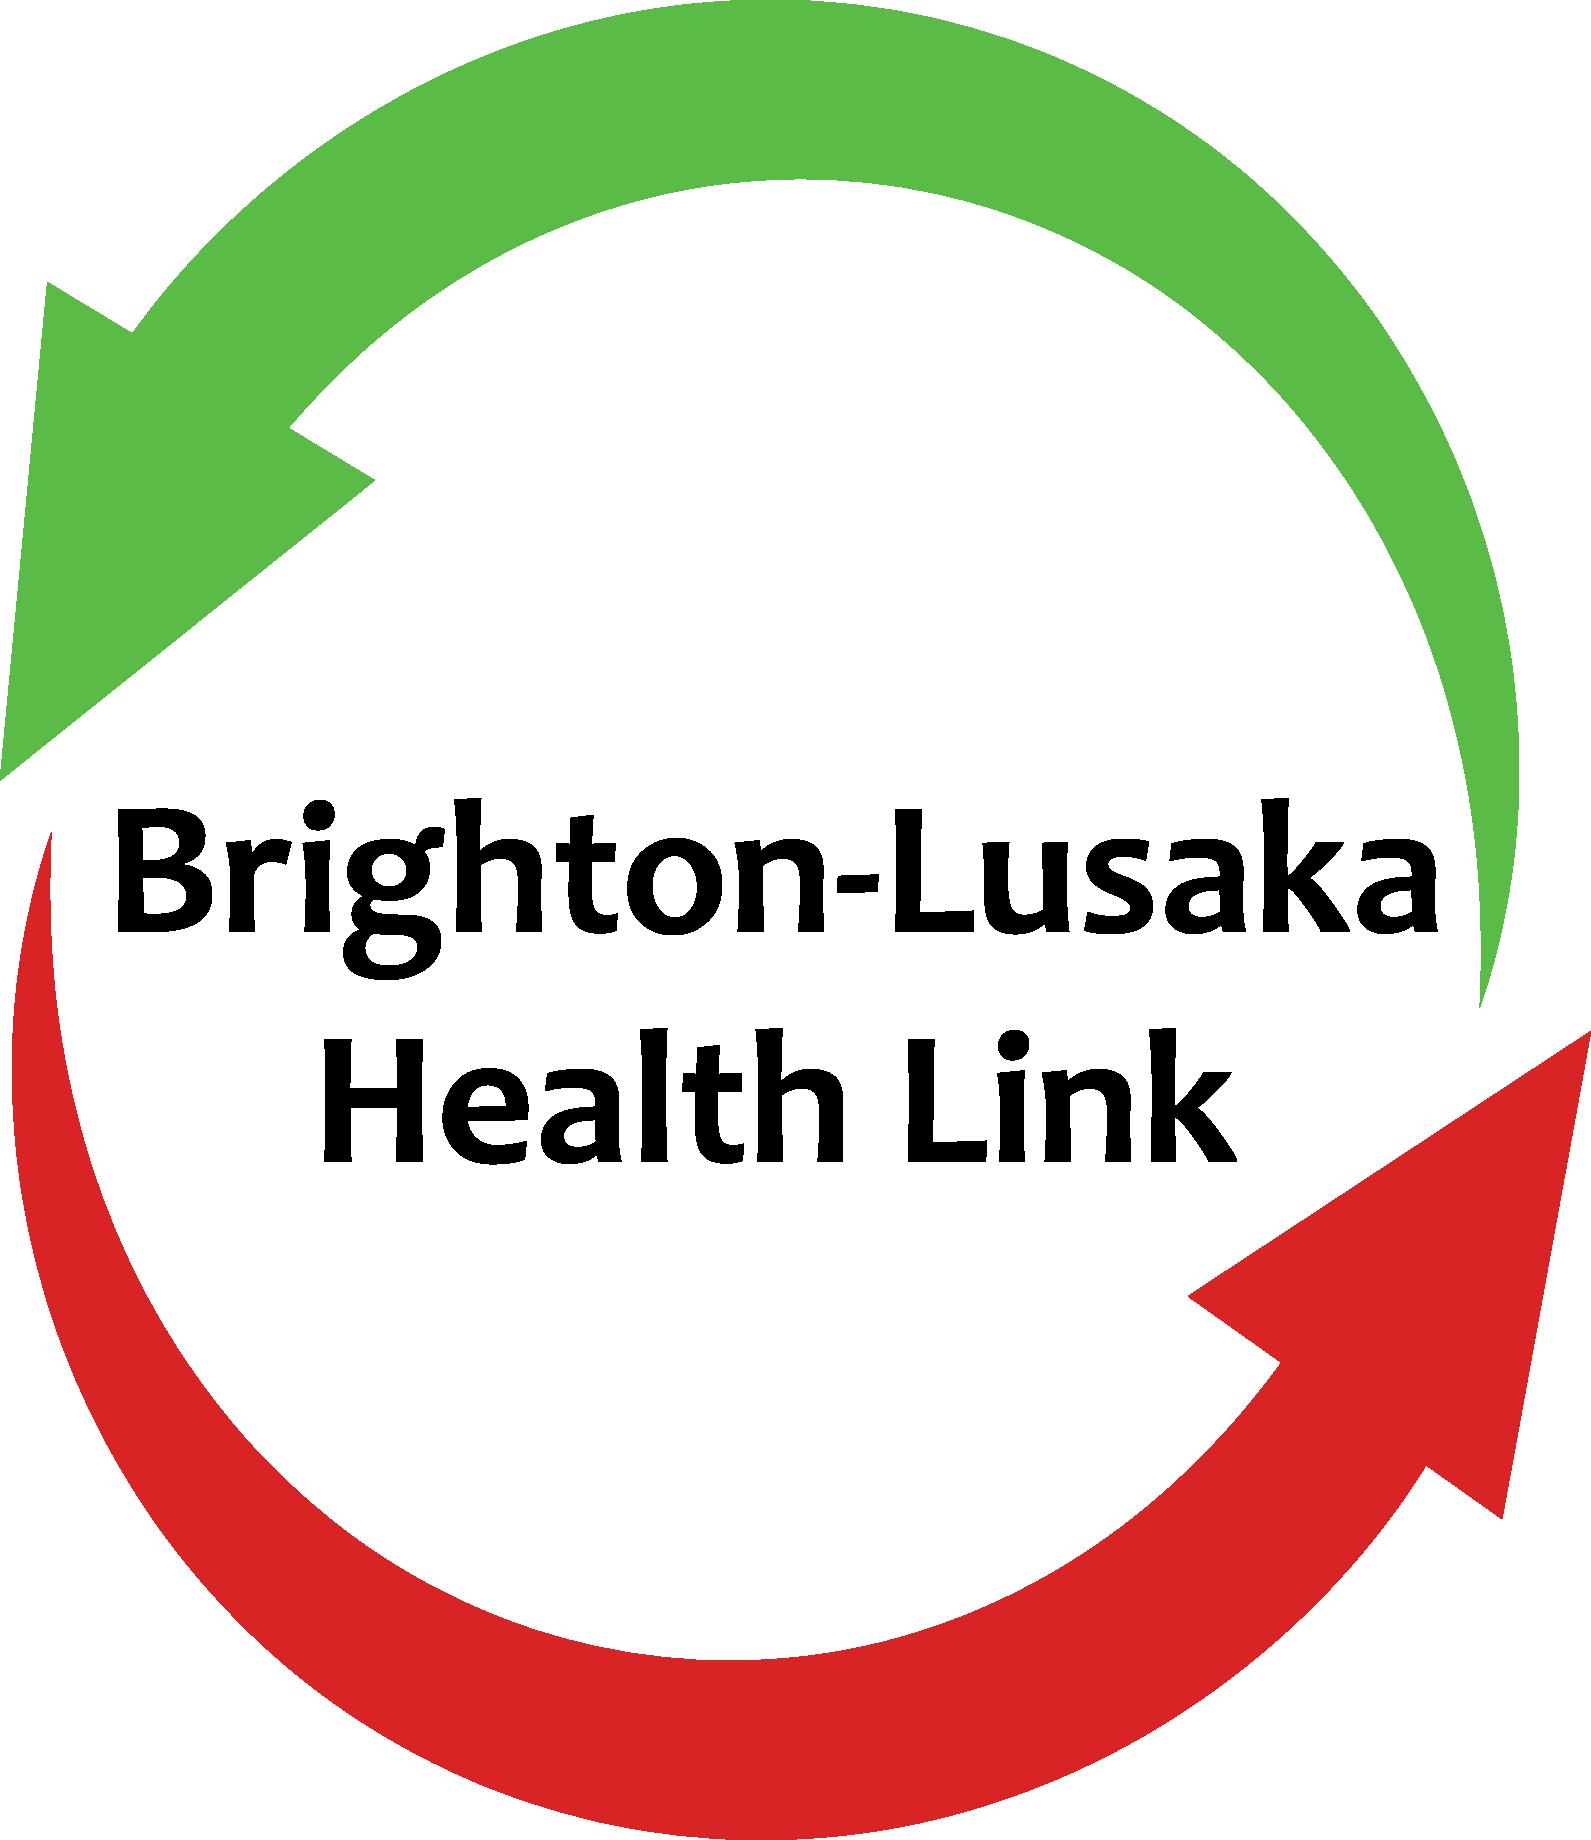 Brighton-Lusaka Health Link